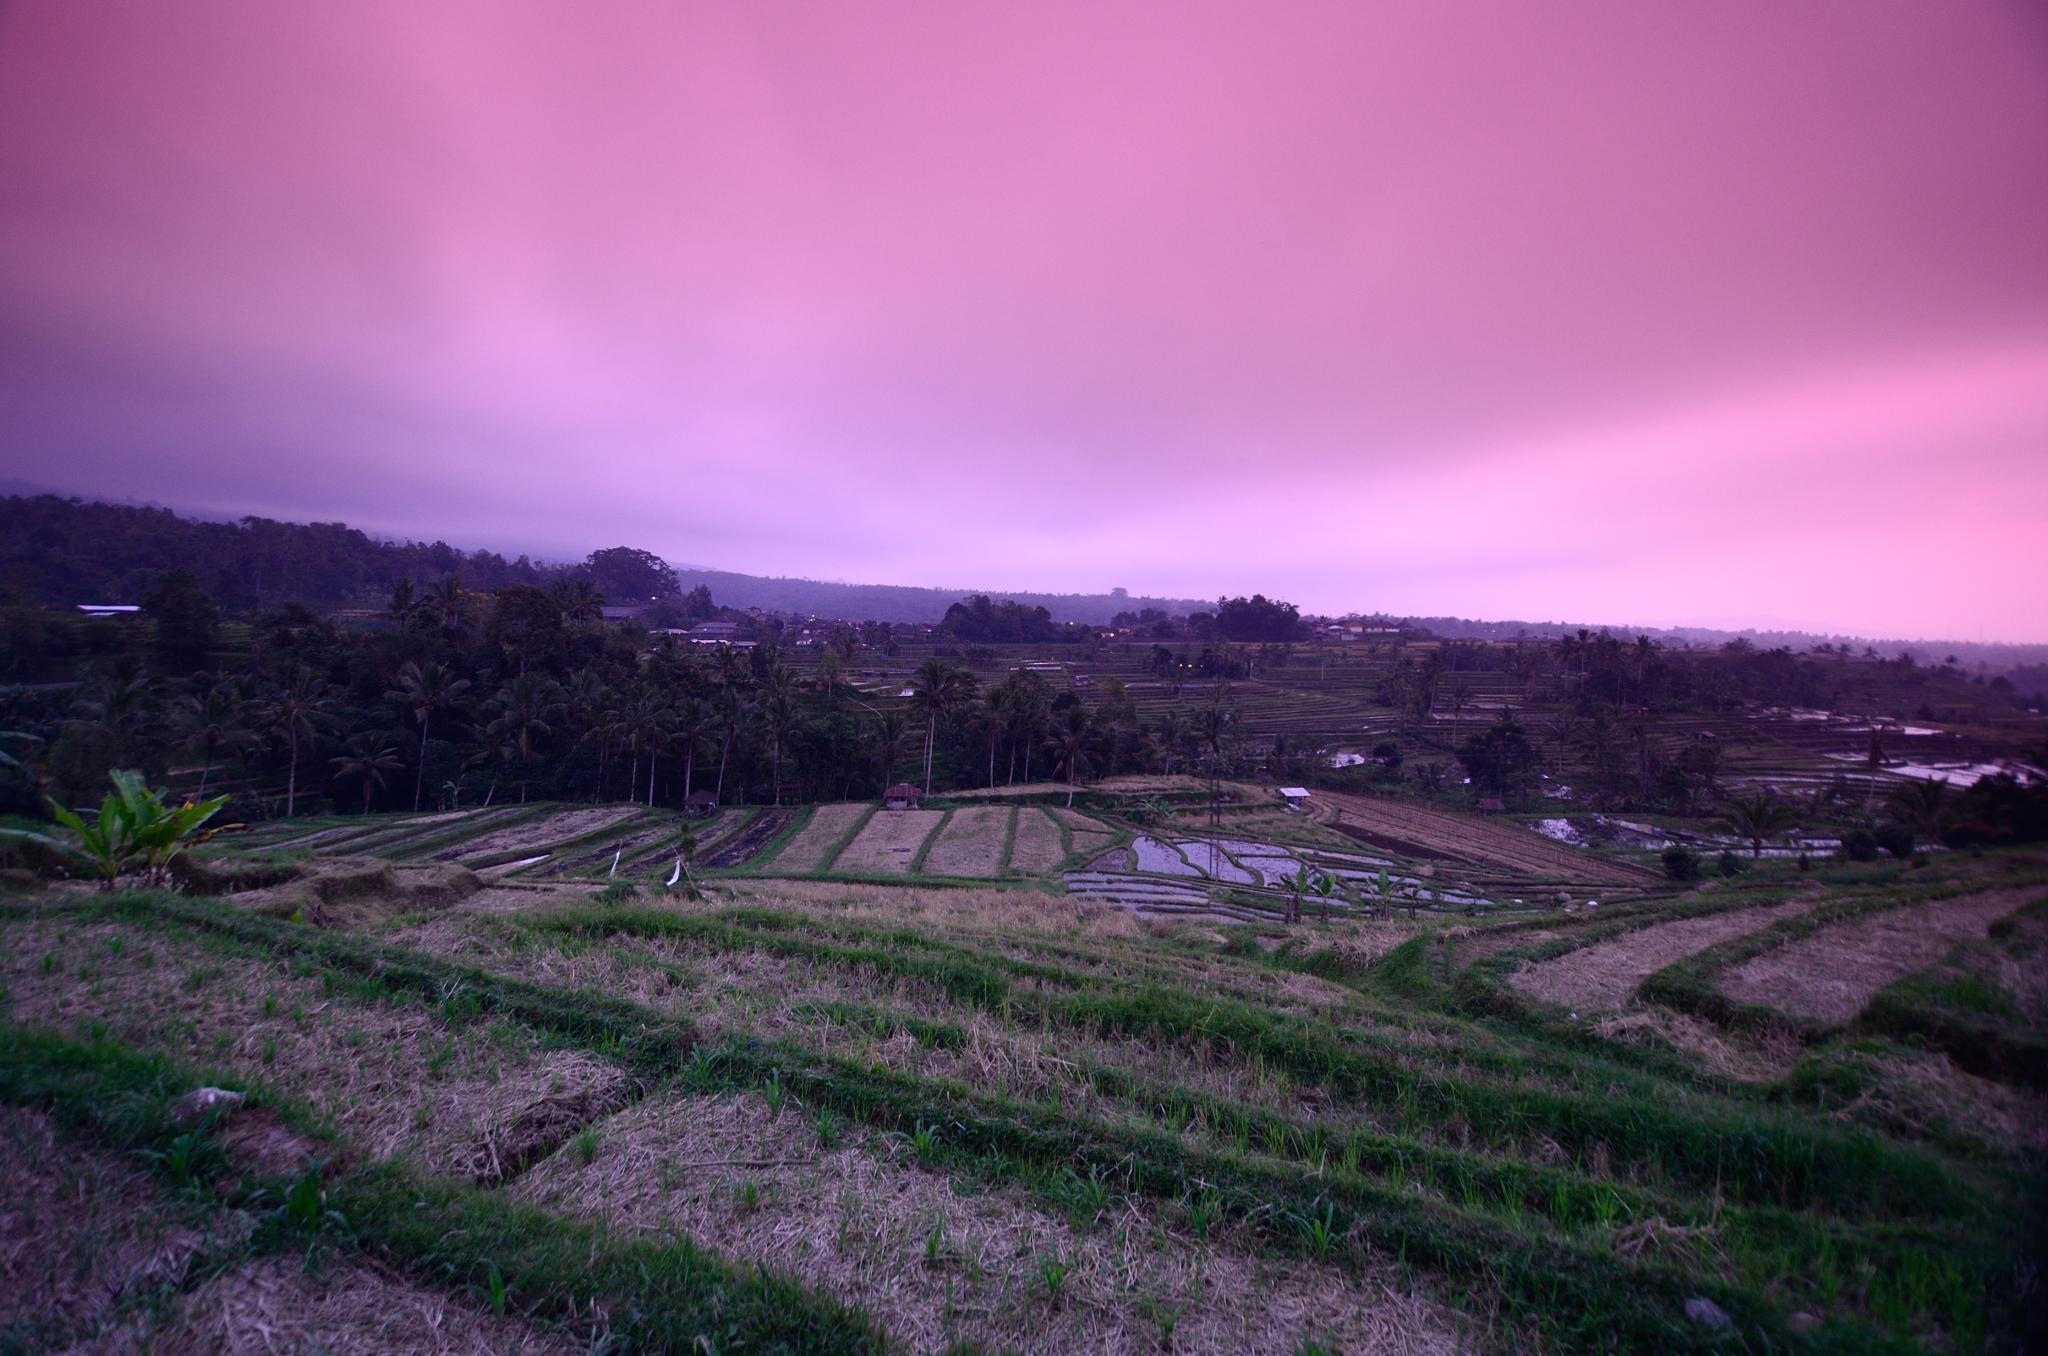 Jatiluwih Rice Field, Bali by Yulius